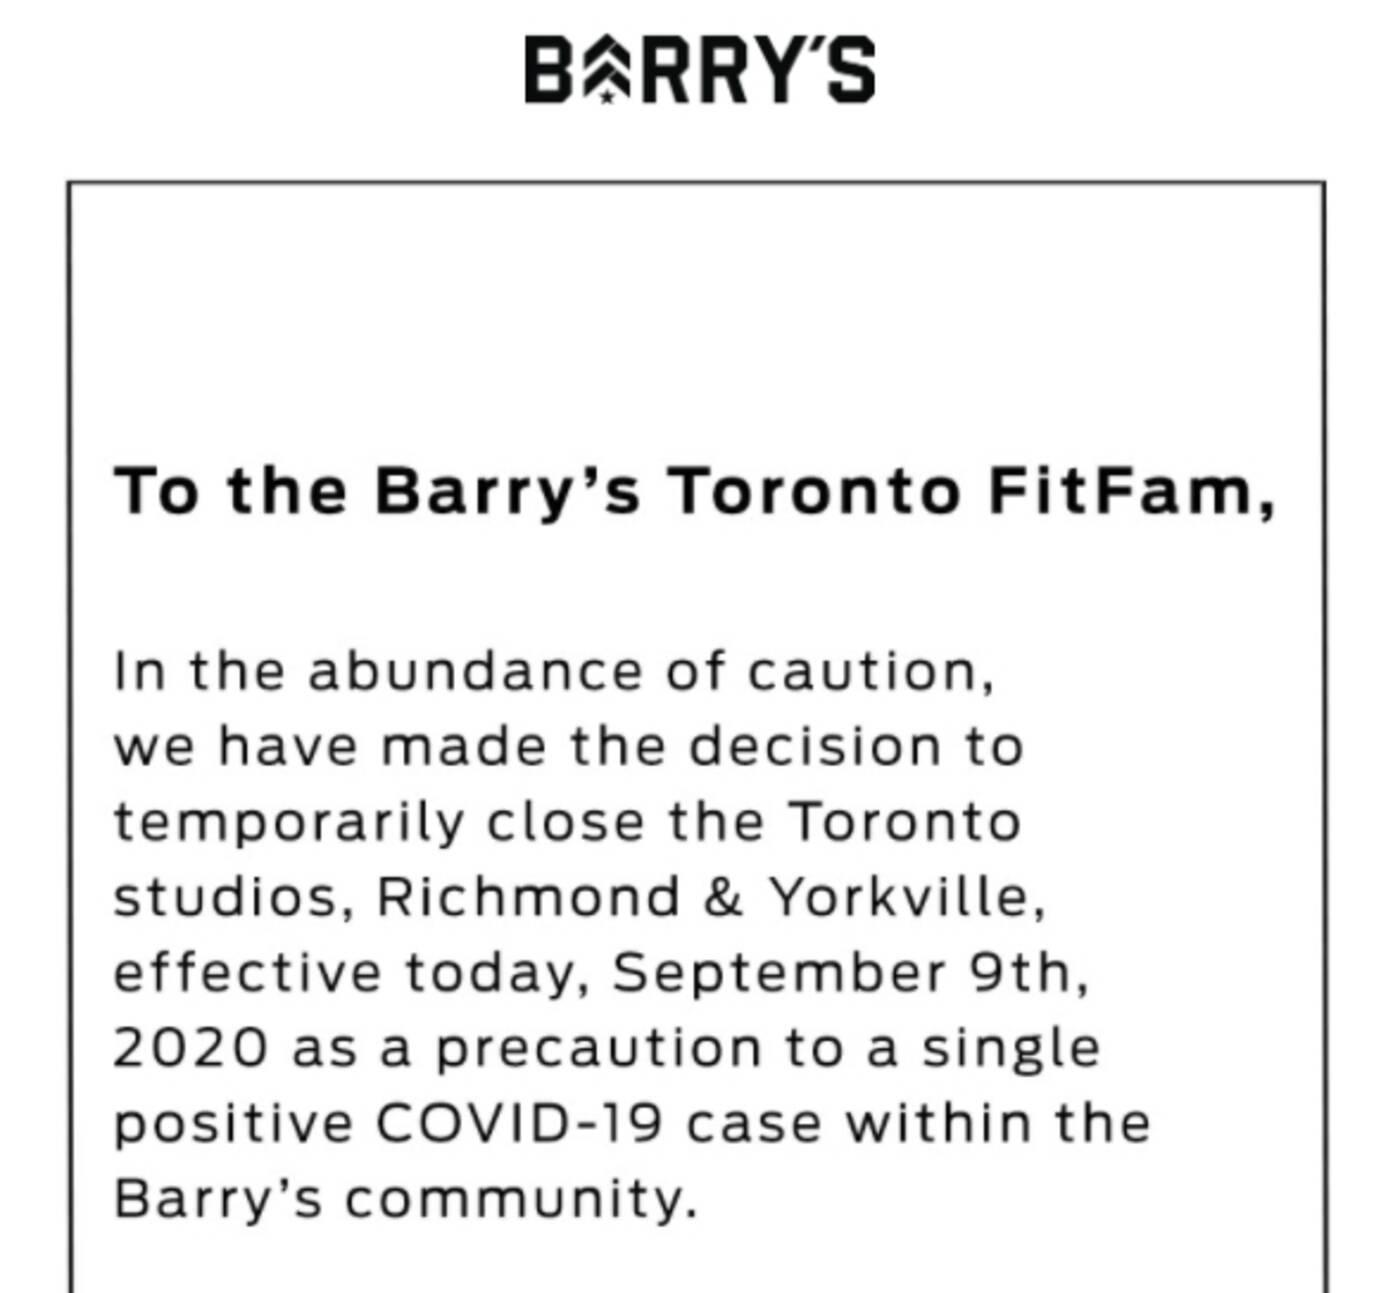 barry's toronto